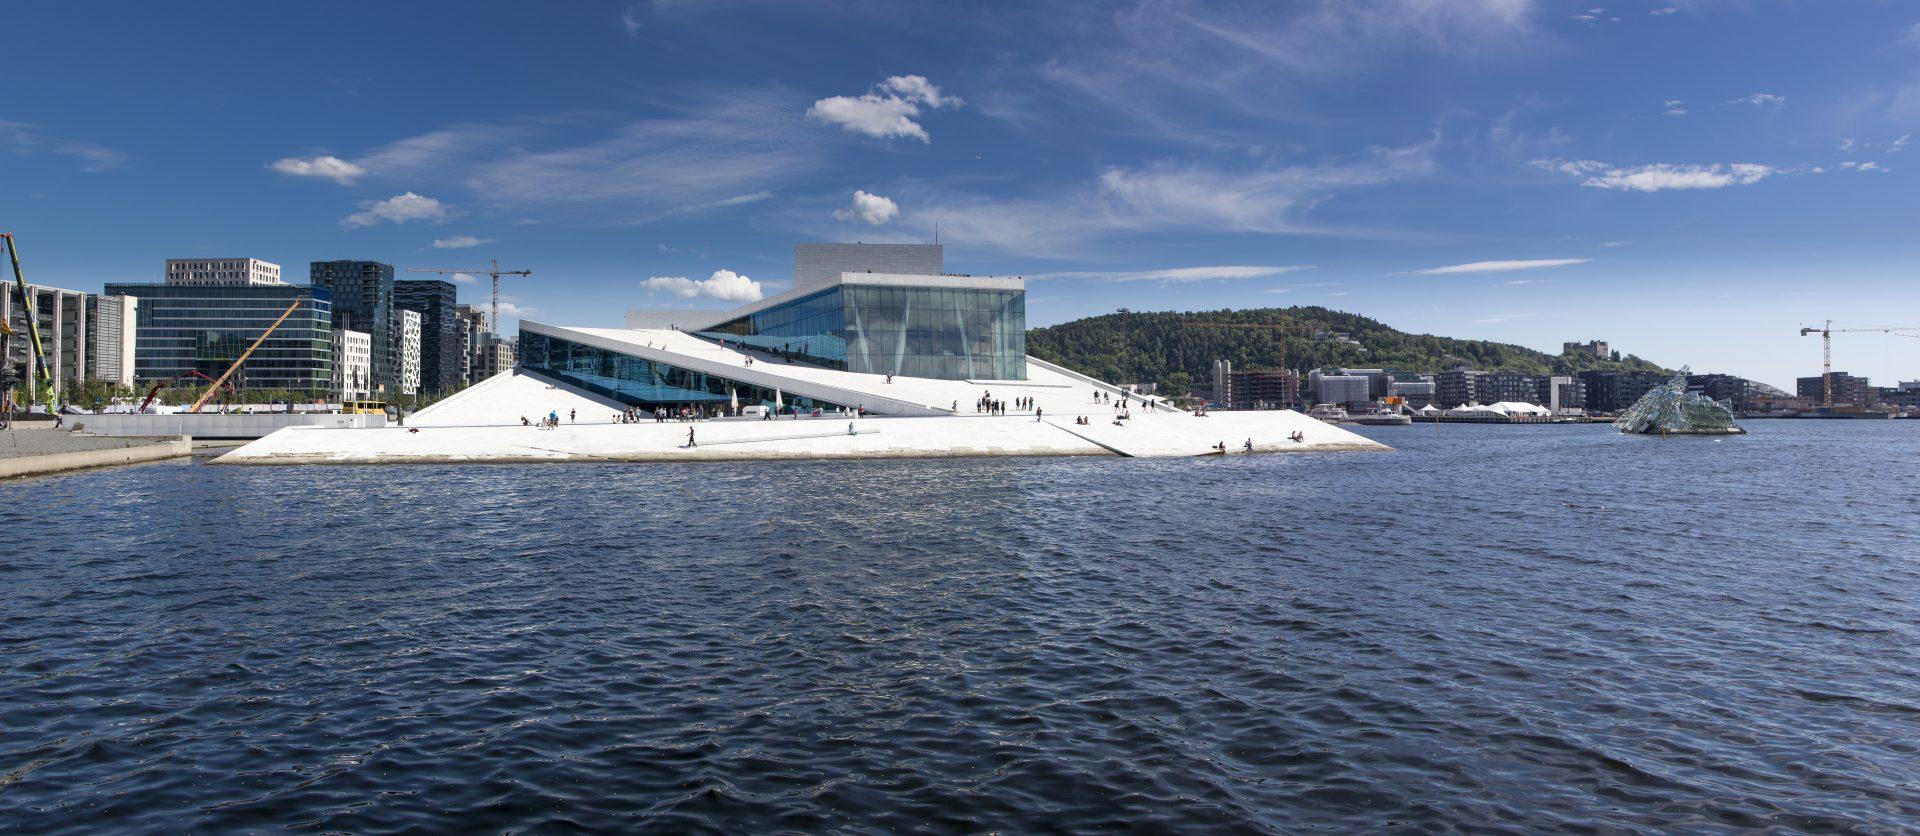 Pure Mathematics in Norway